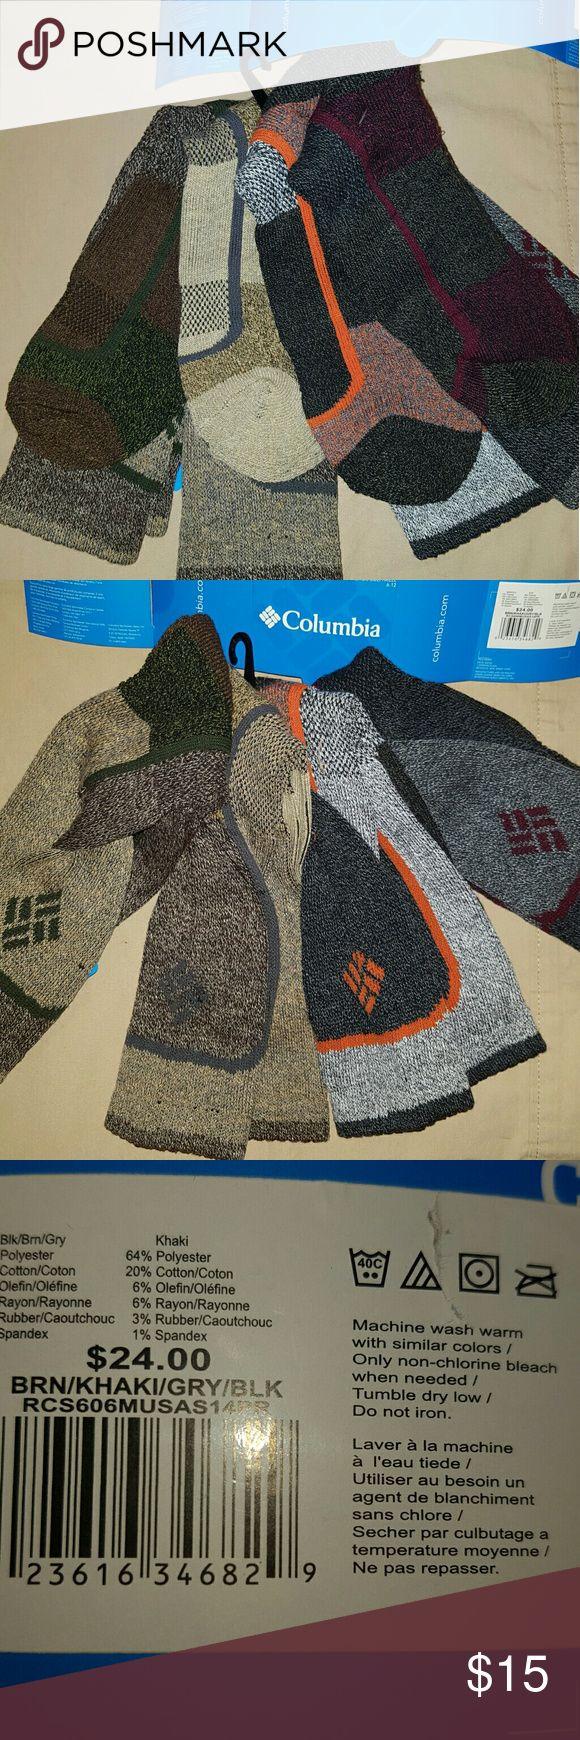 Columbia 4 pack men's socks Men's socks, soft, medium weight comfy socks, great for casual, semi casual or dressy. 1 of each color, total 4 pairs. Men's shoe size 6 - 12, ladies shoe size  8 - 14 Columbia Underwear & Socks Casual Socks